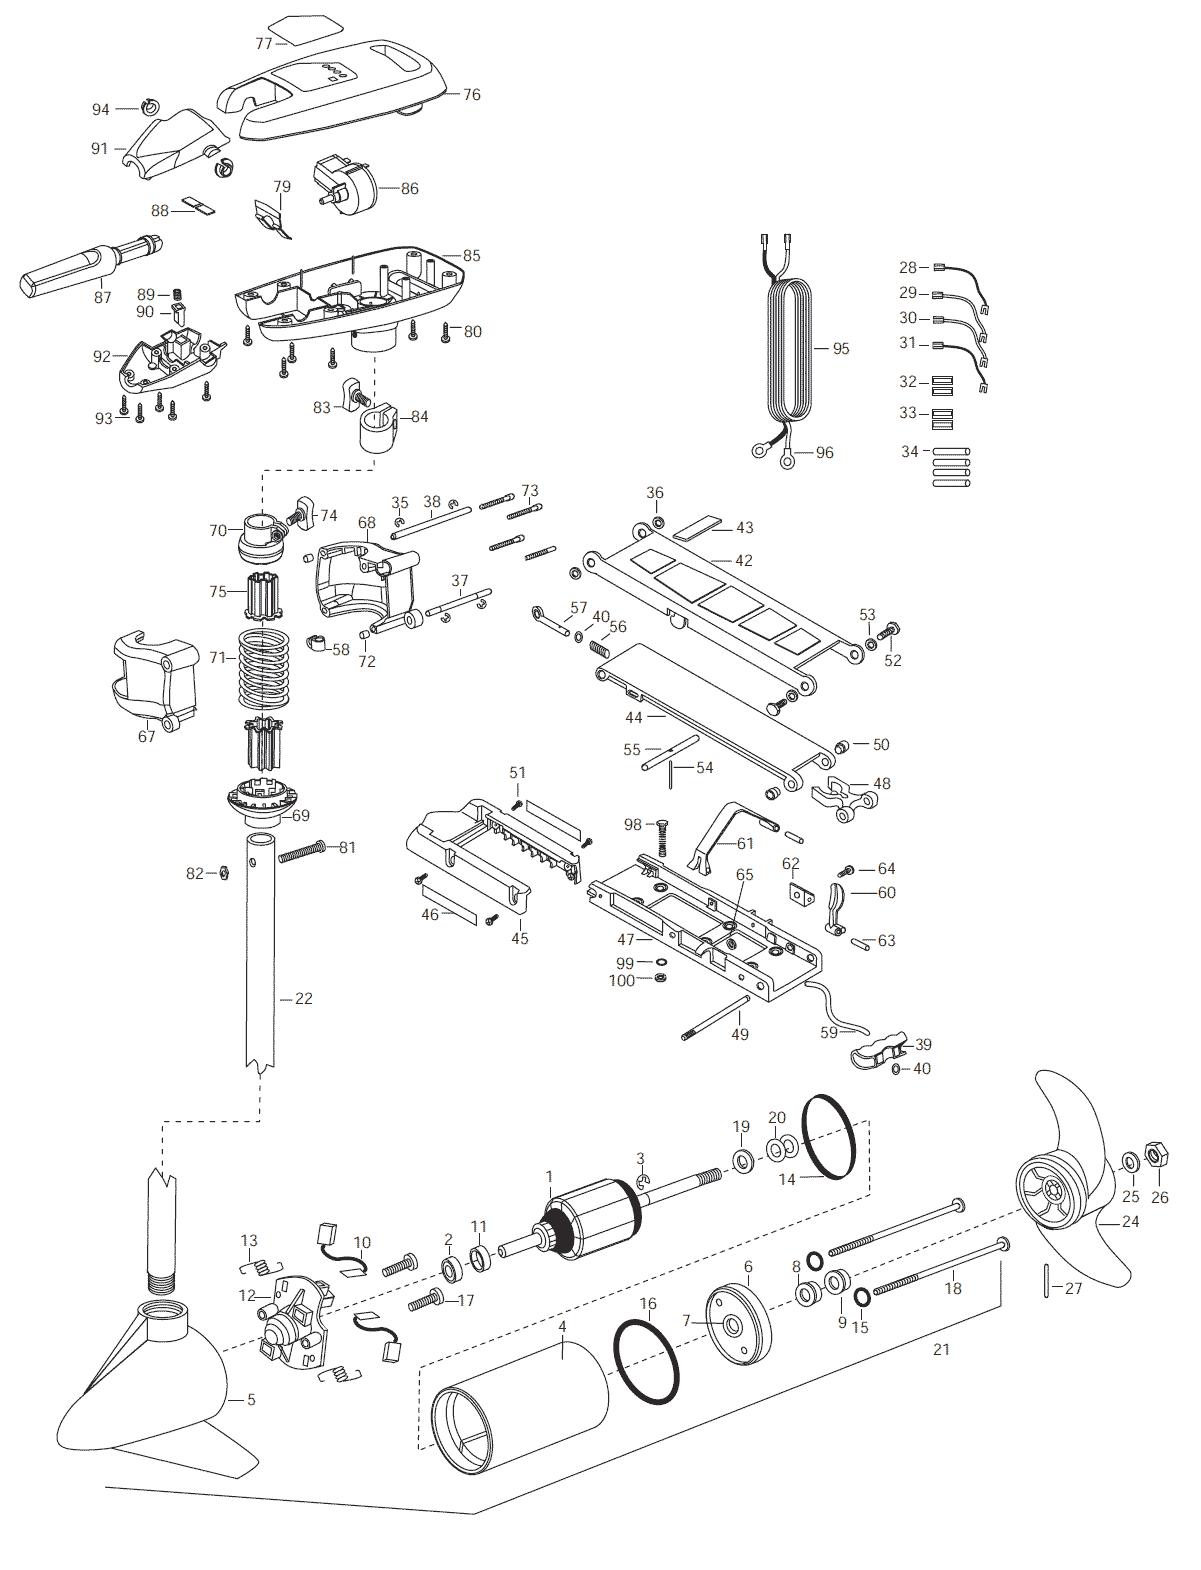 minn kota all terrain 55 hand control parts 2003 from. Black Bedroom Furniture Sets. Home Design Ideas